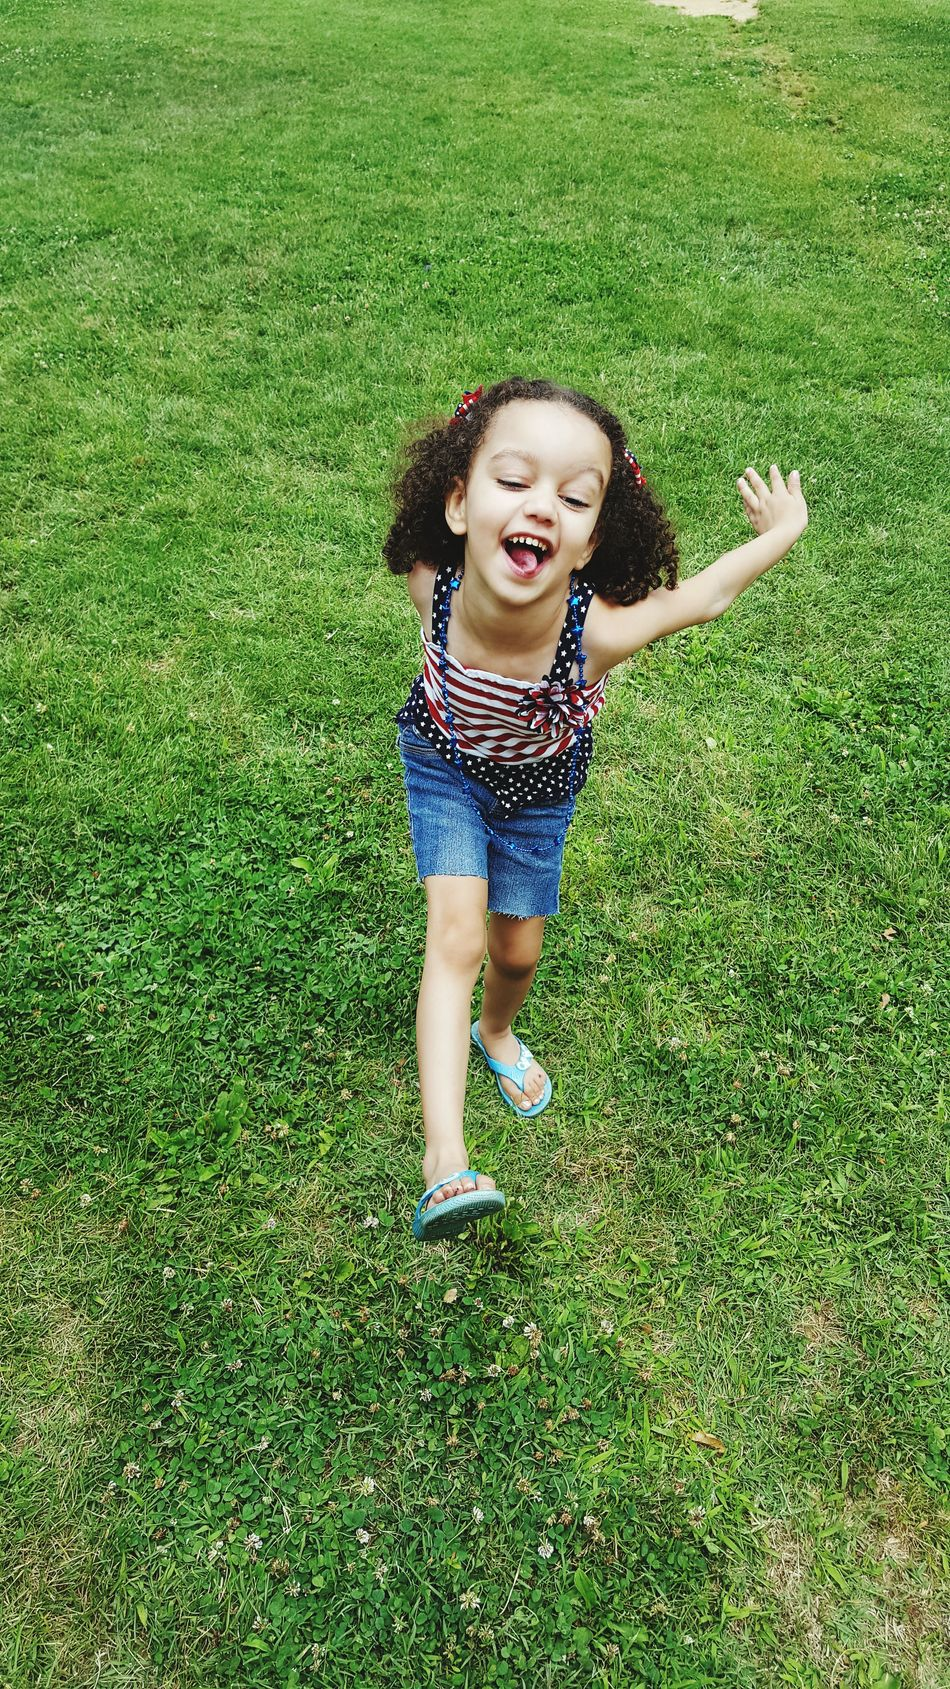 4th Of July 2016 Playground Kids Having Fun July 4th